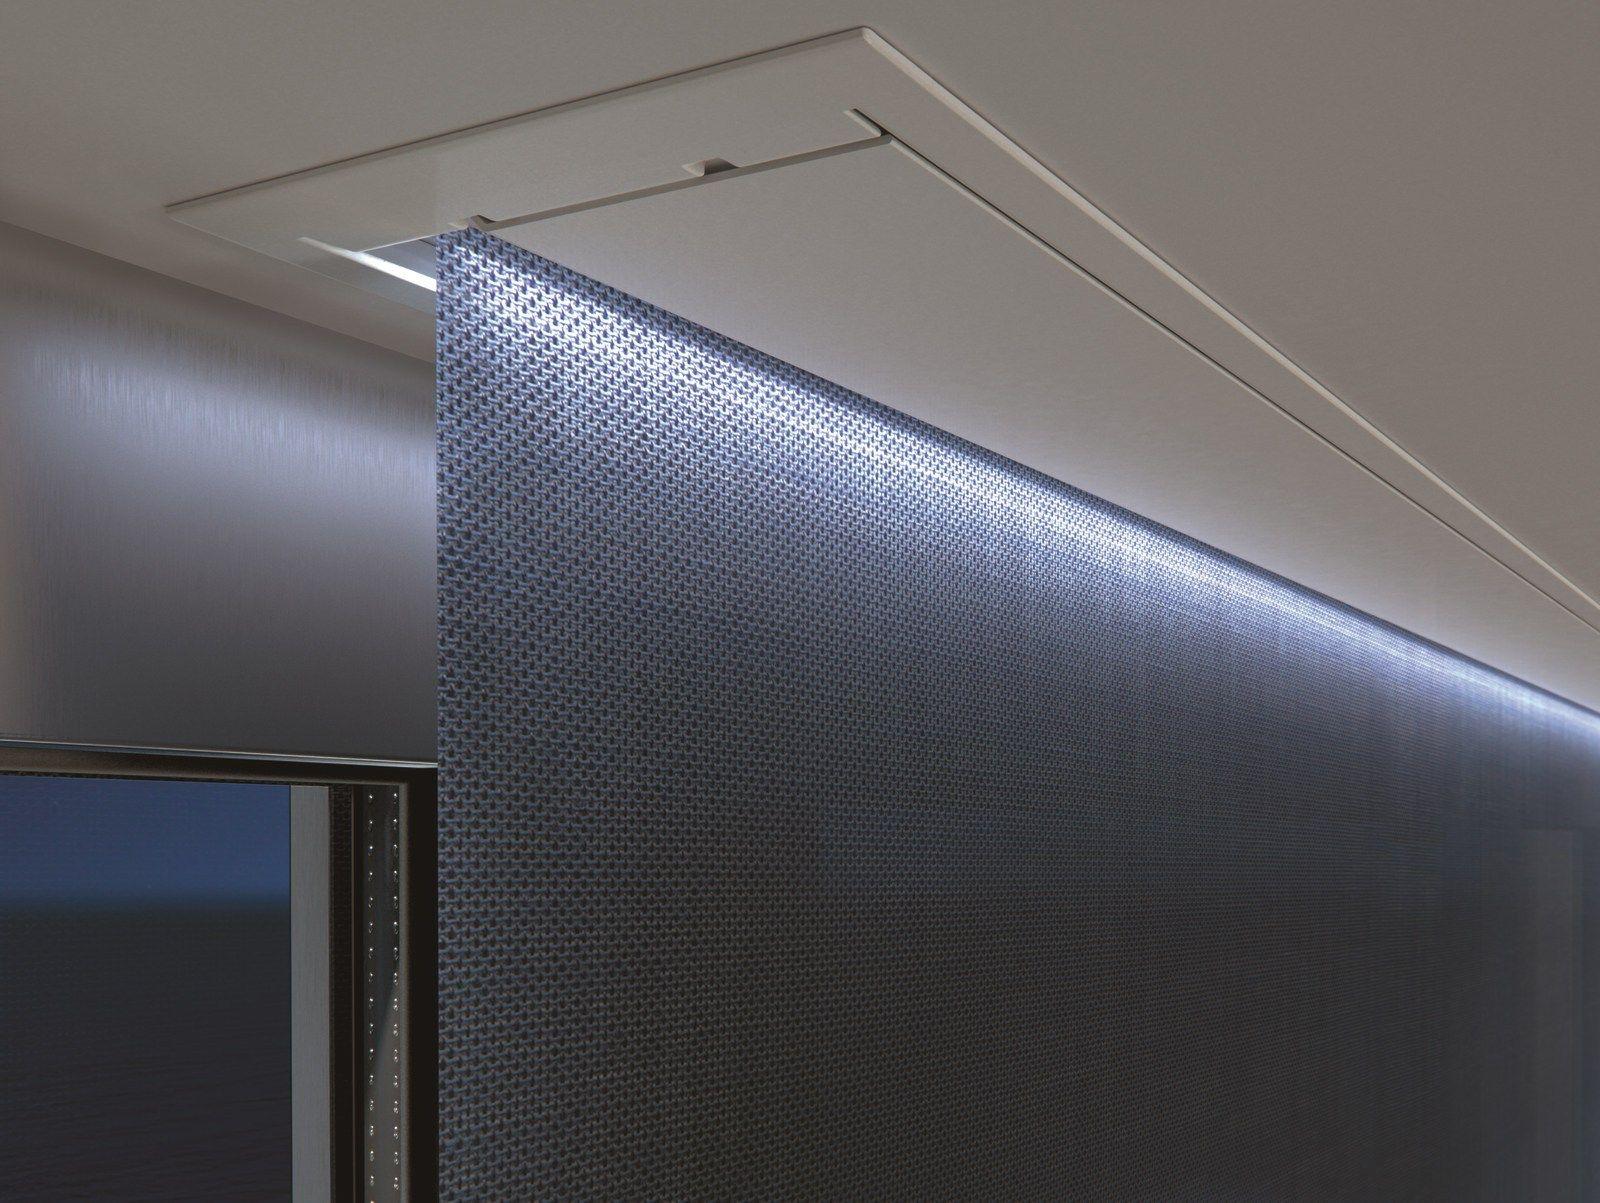 Cortina enrollable el ctrica de tela de oscurecimiento for Uniform spa sistemi per serramenti